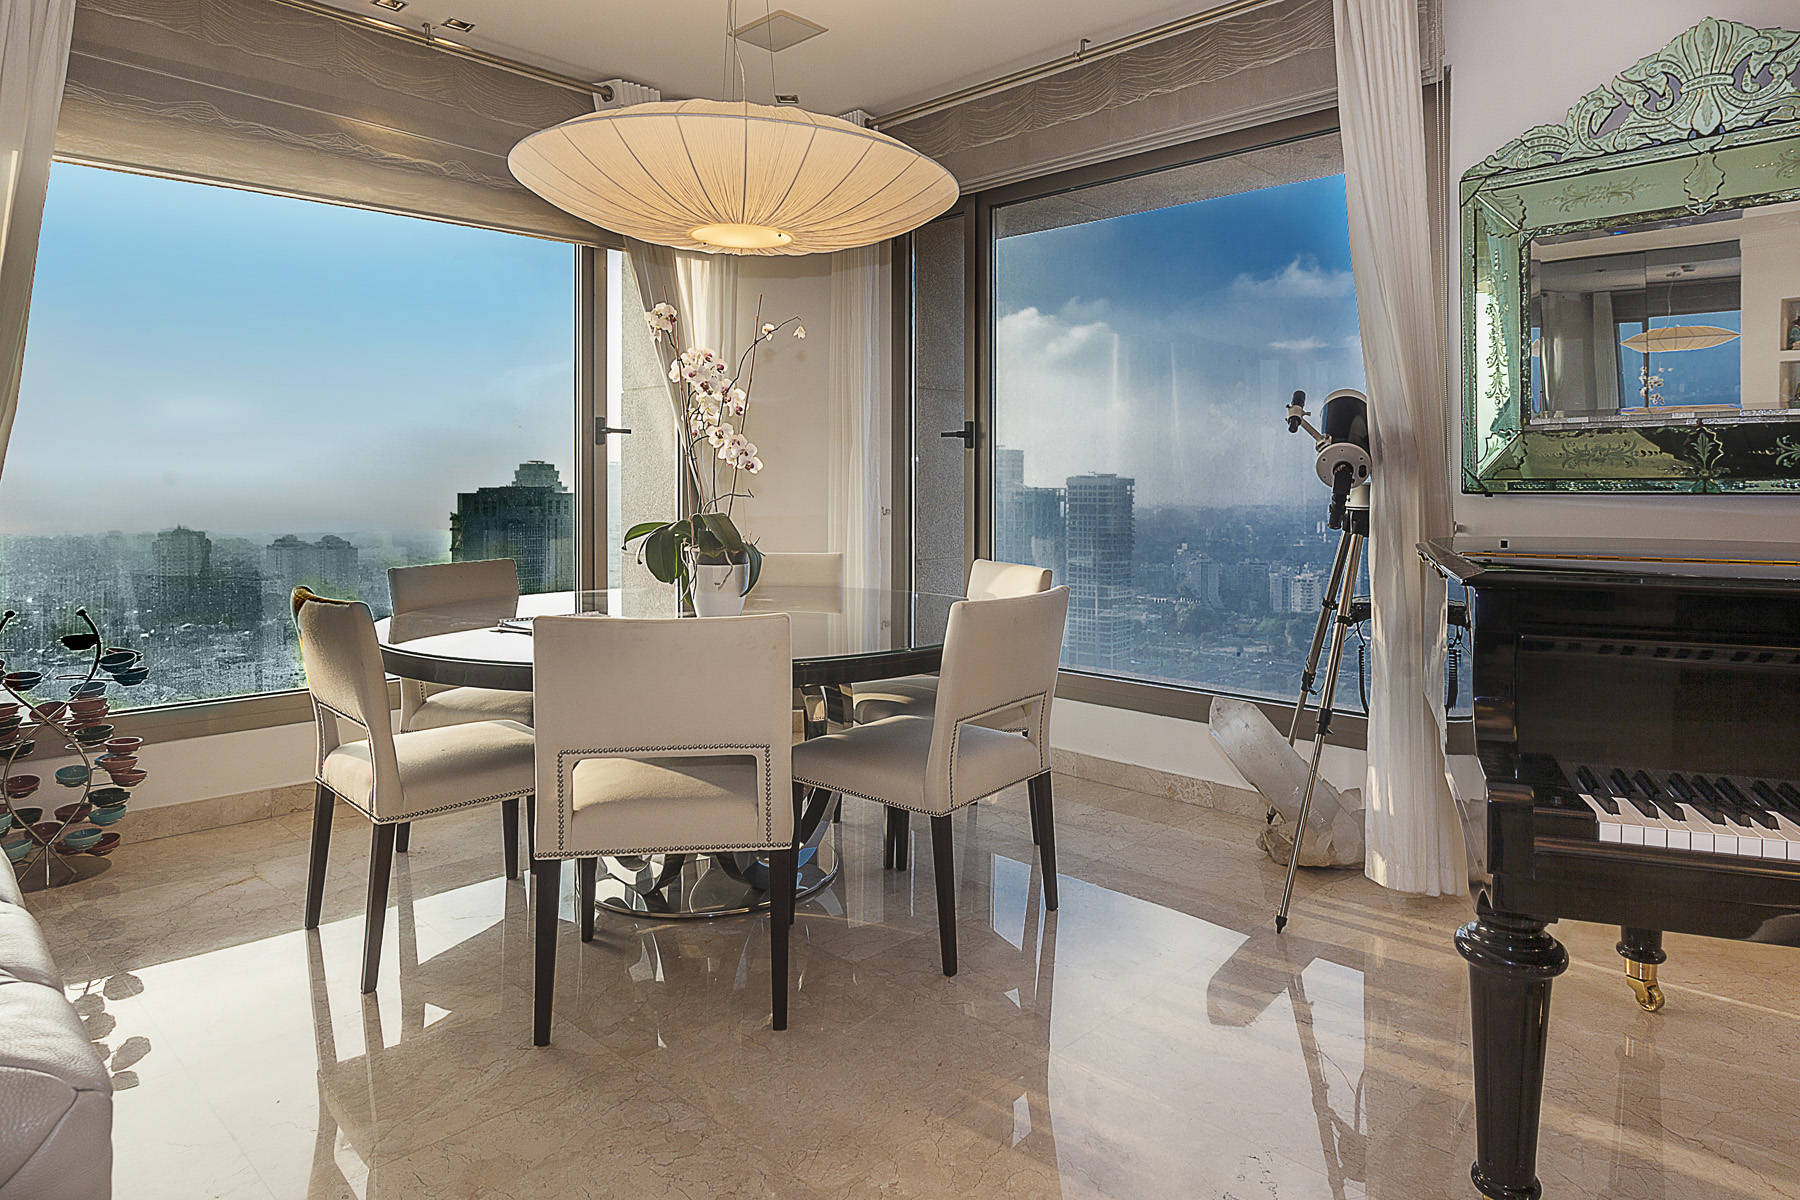 Additional photo for property listing at Refined Luxury Apartment in Leonardo City Tower 拉马特甘, 以色列 以色列